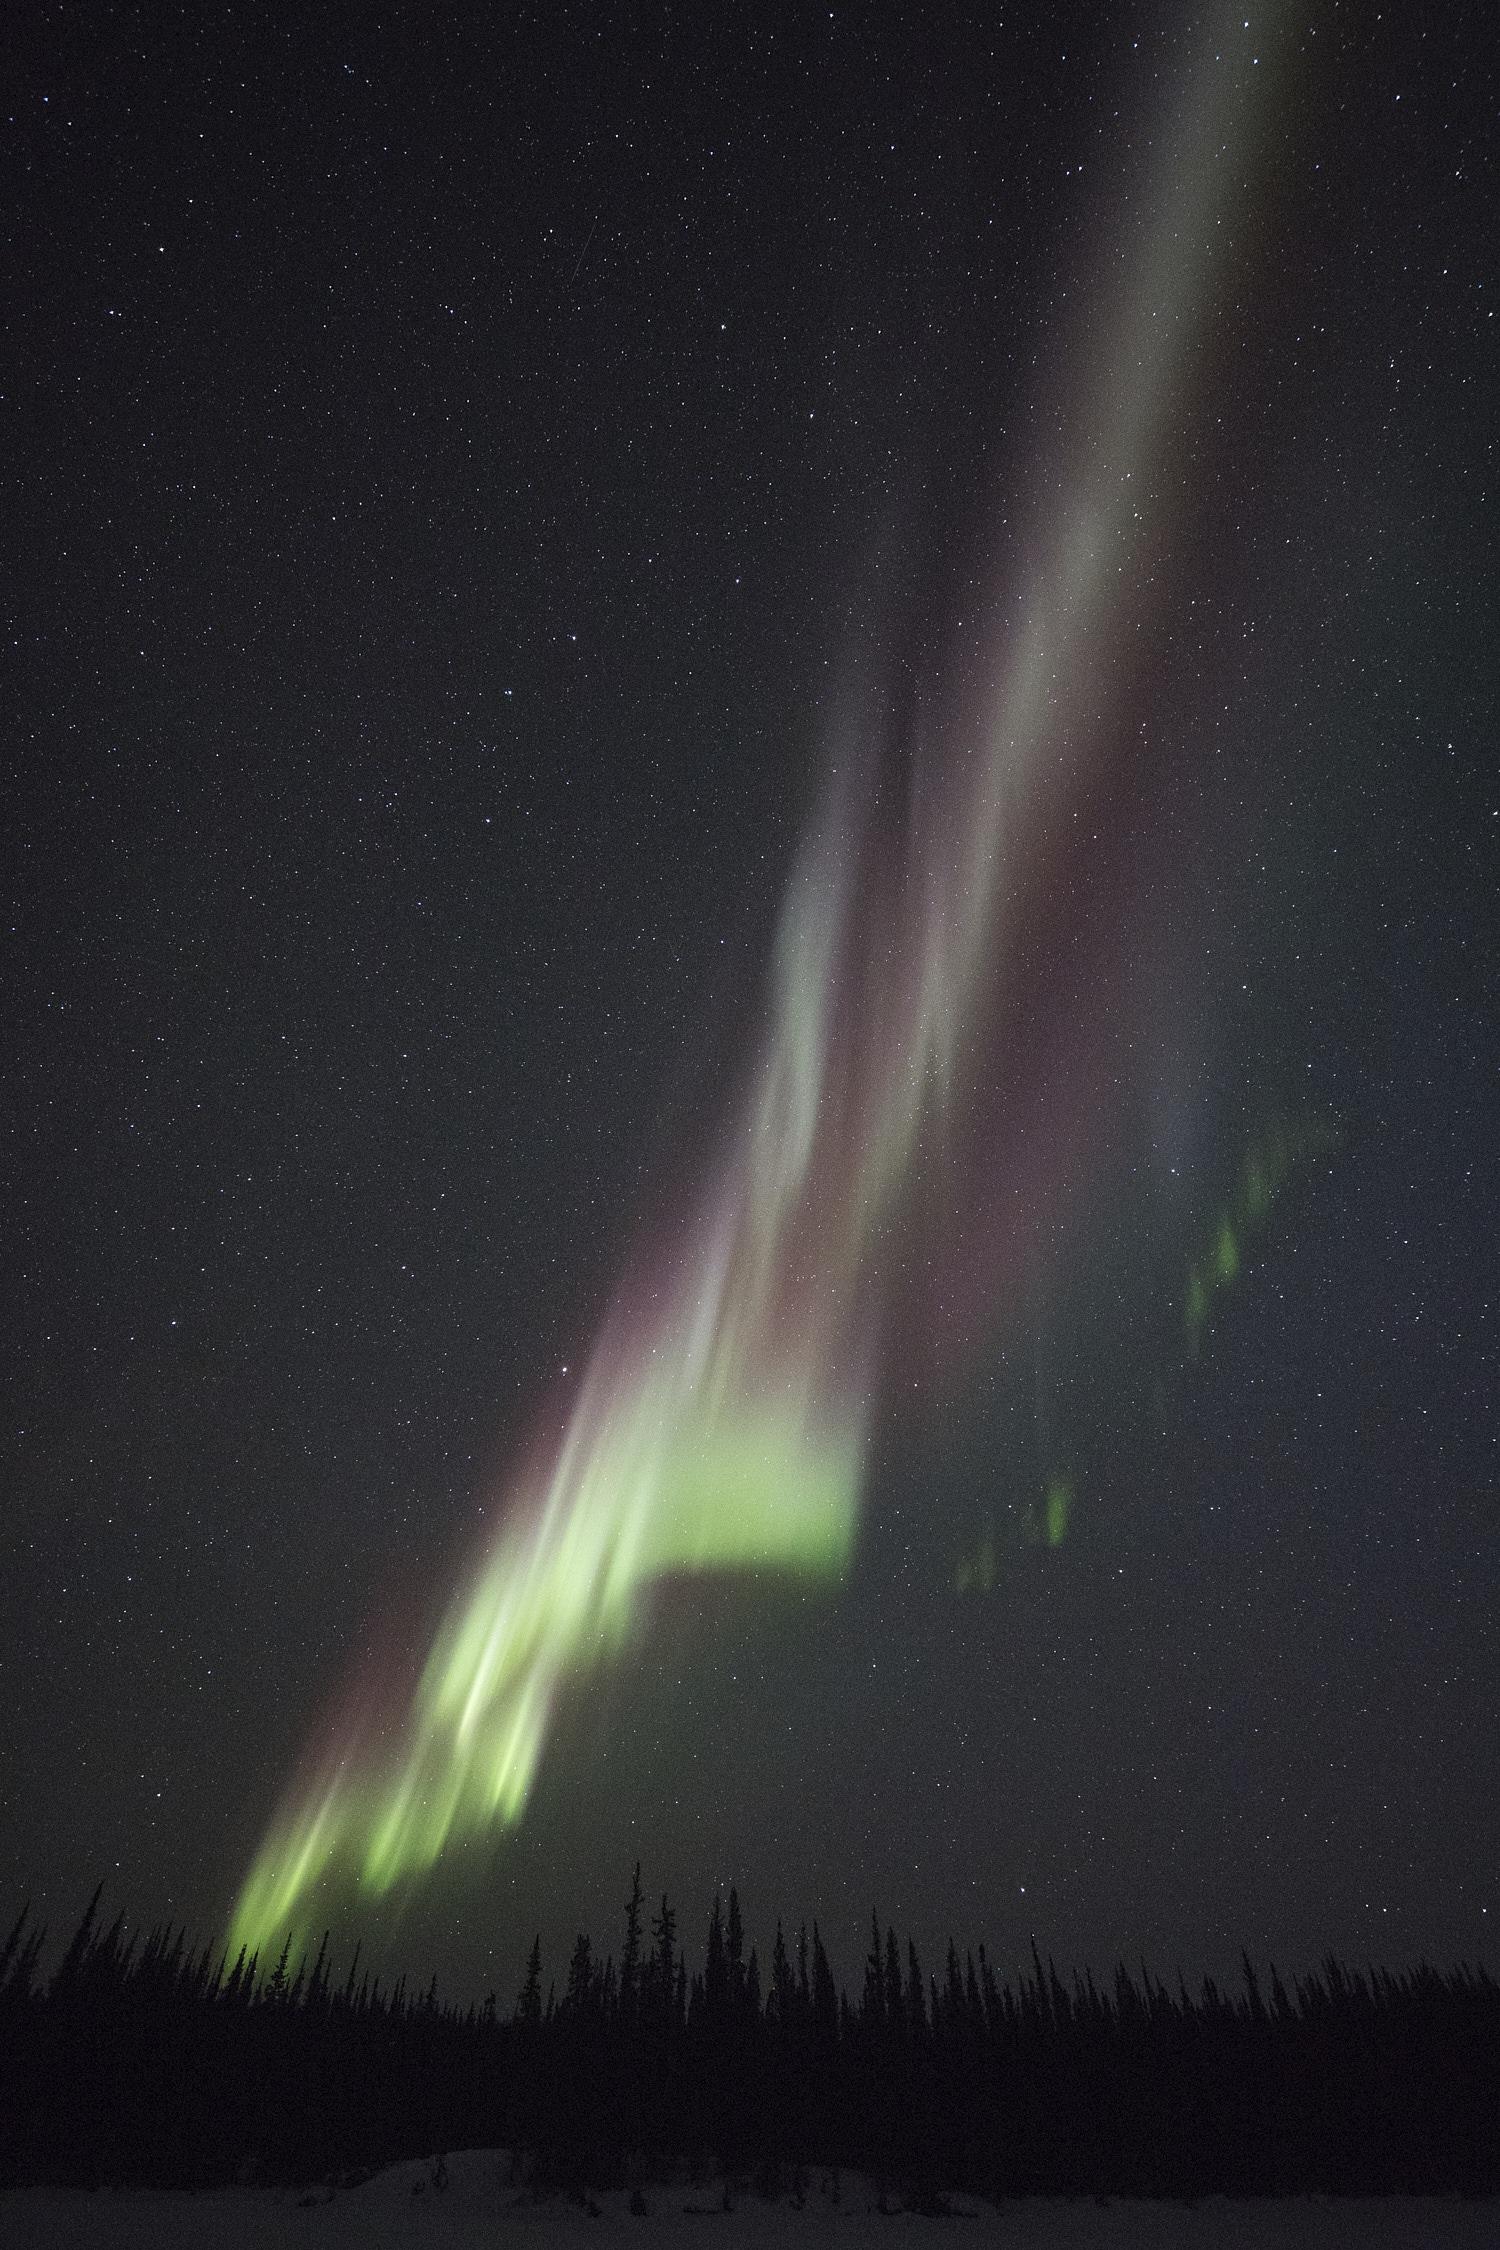 Best Northern Lights Photos of 2017 - 2018 Season - Yellowknife Canada - 22.jpg